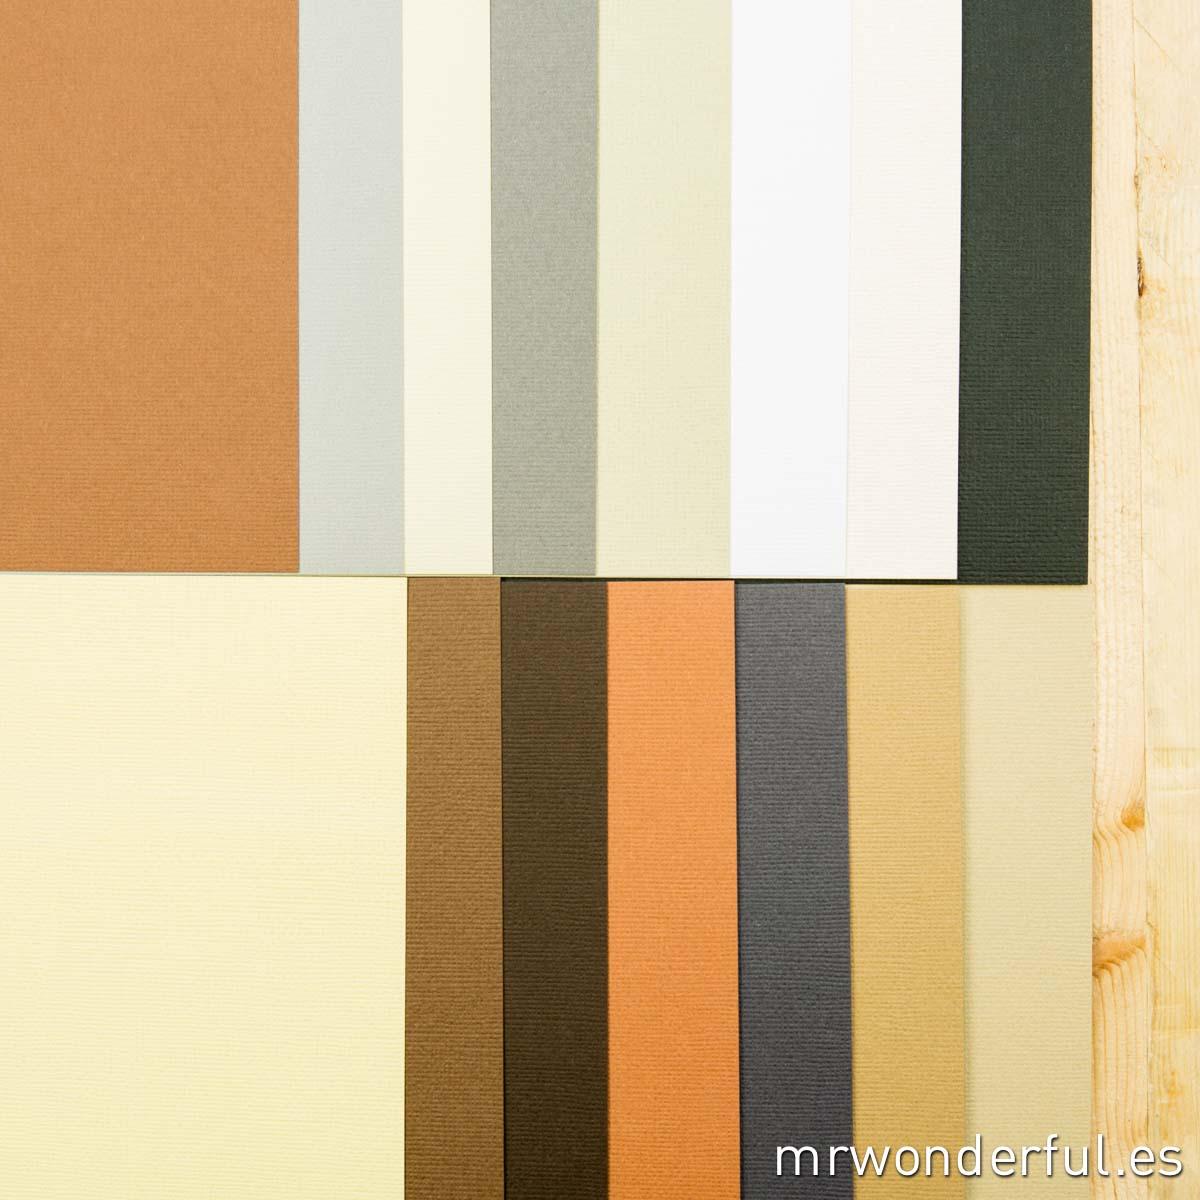 mrwonderfulshop_71252_papeles_color_neutros_con_textura_para_scrap_01